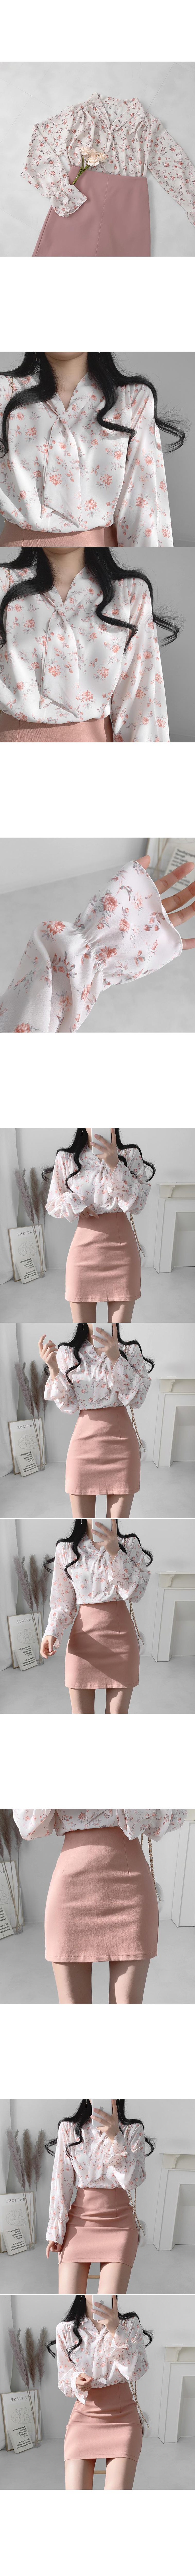 Yuna flower tie flower blouse